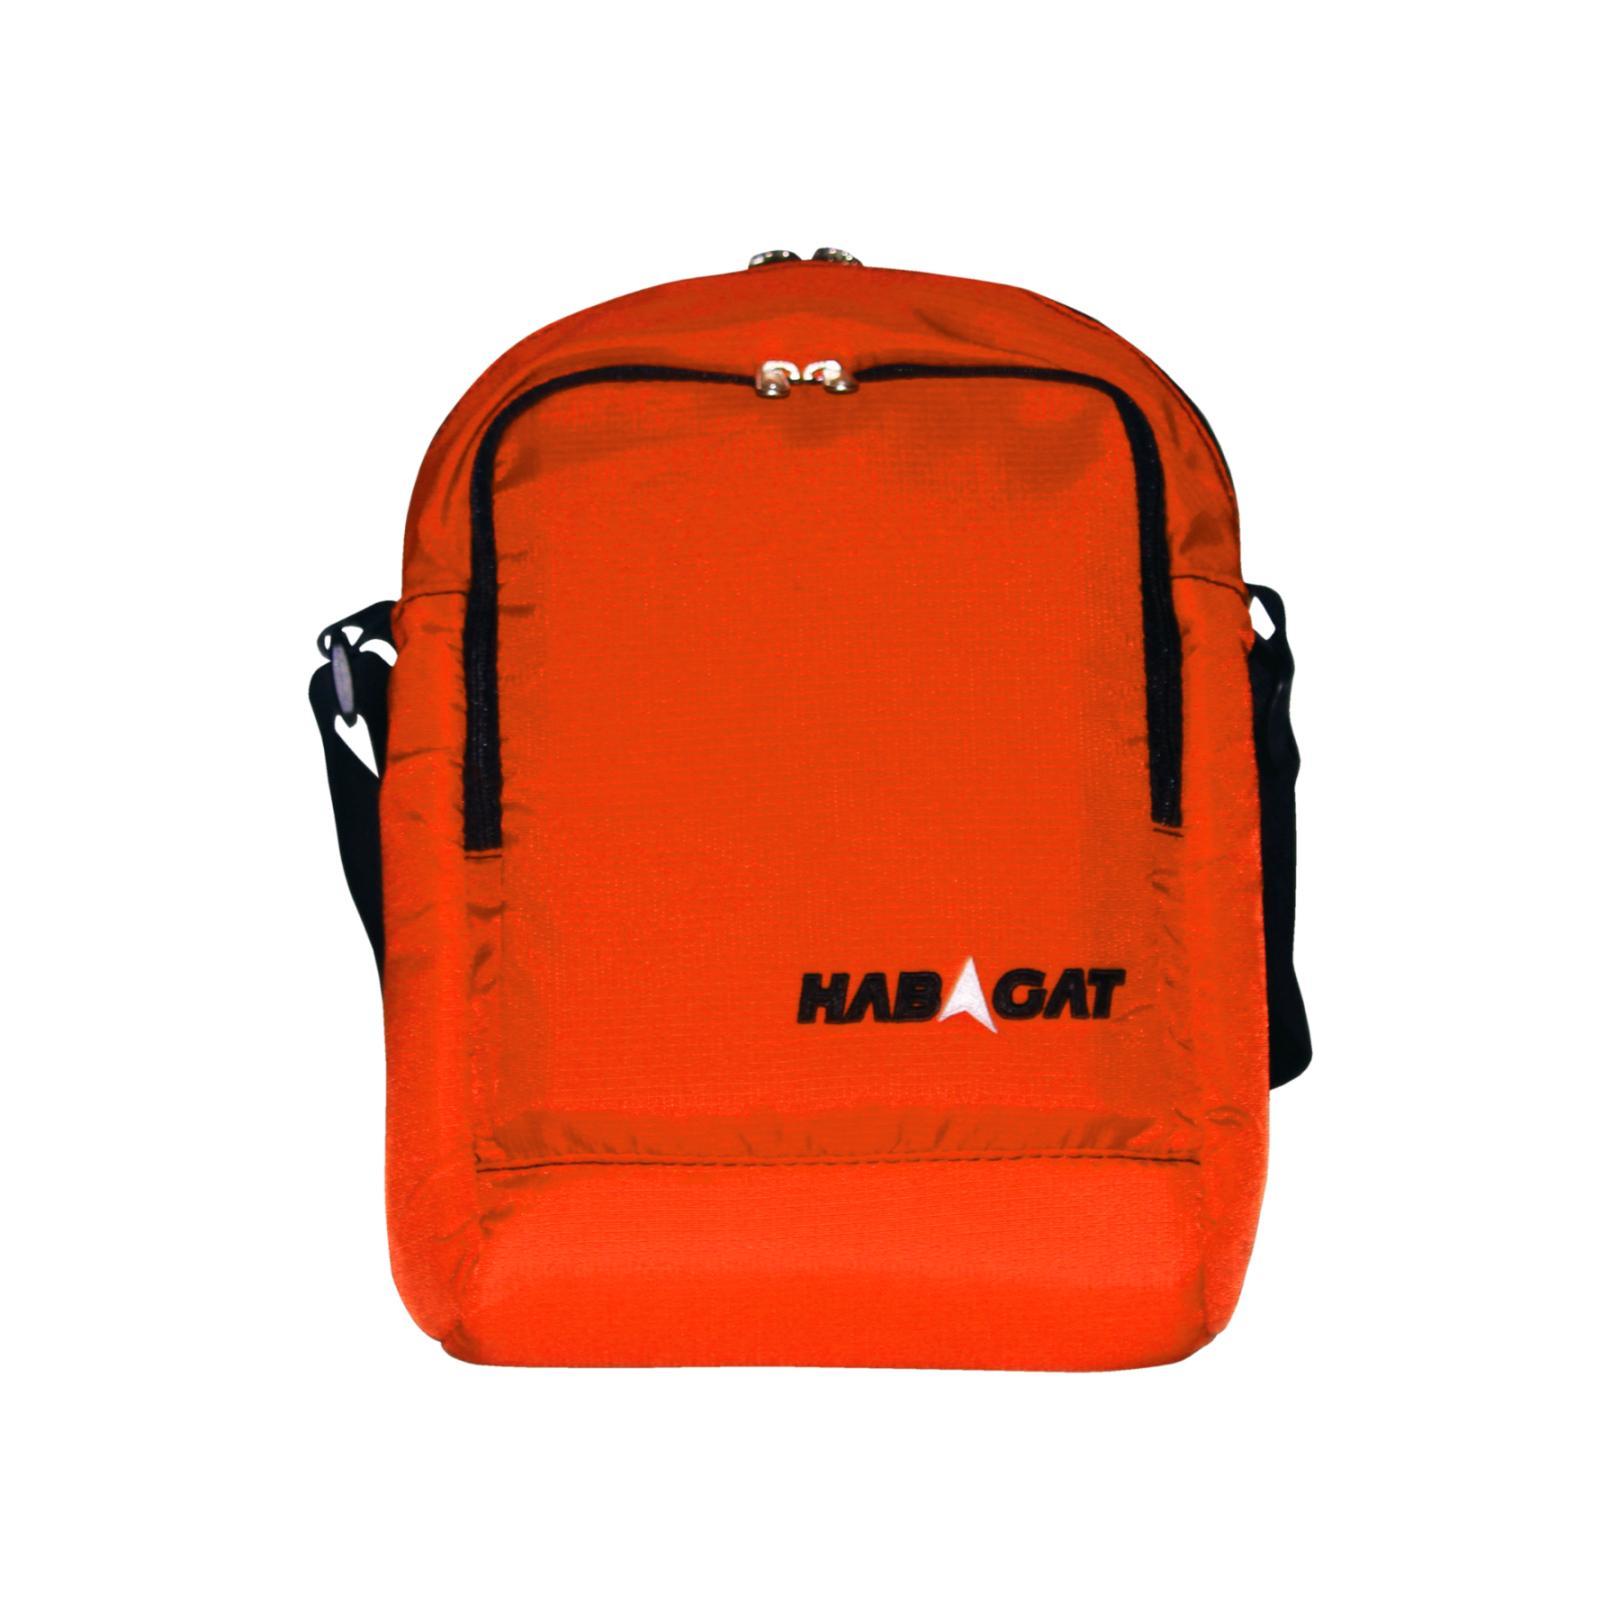 15ad22728407 Waist Bag for sale - Hiking Fanny Pack online brands